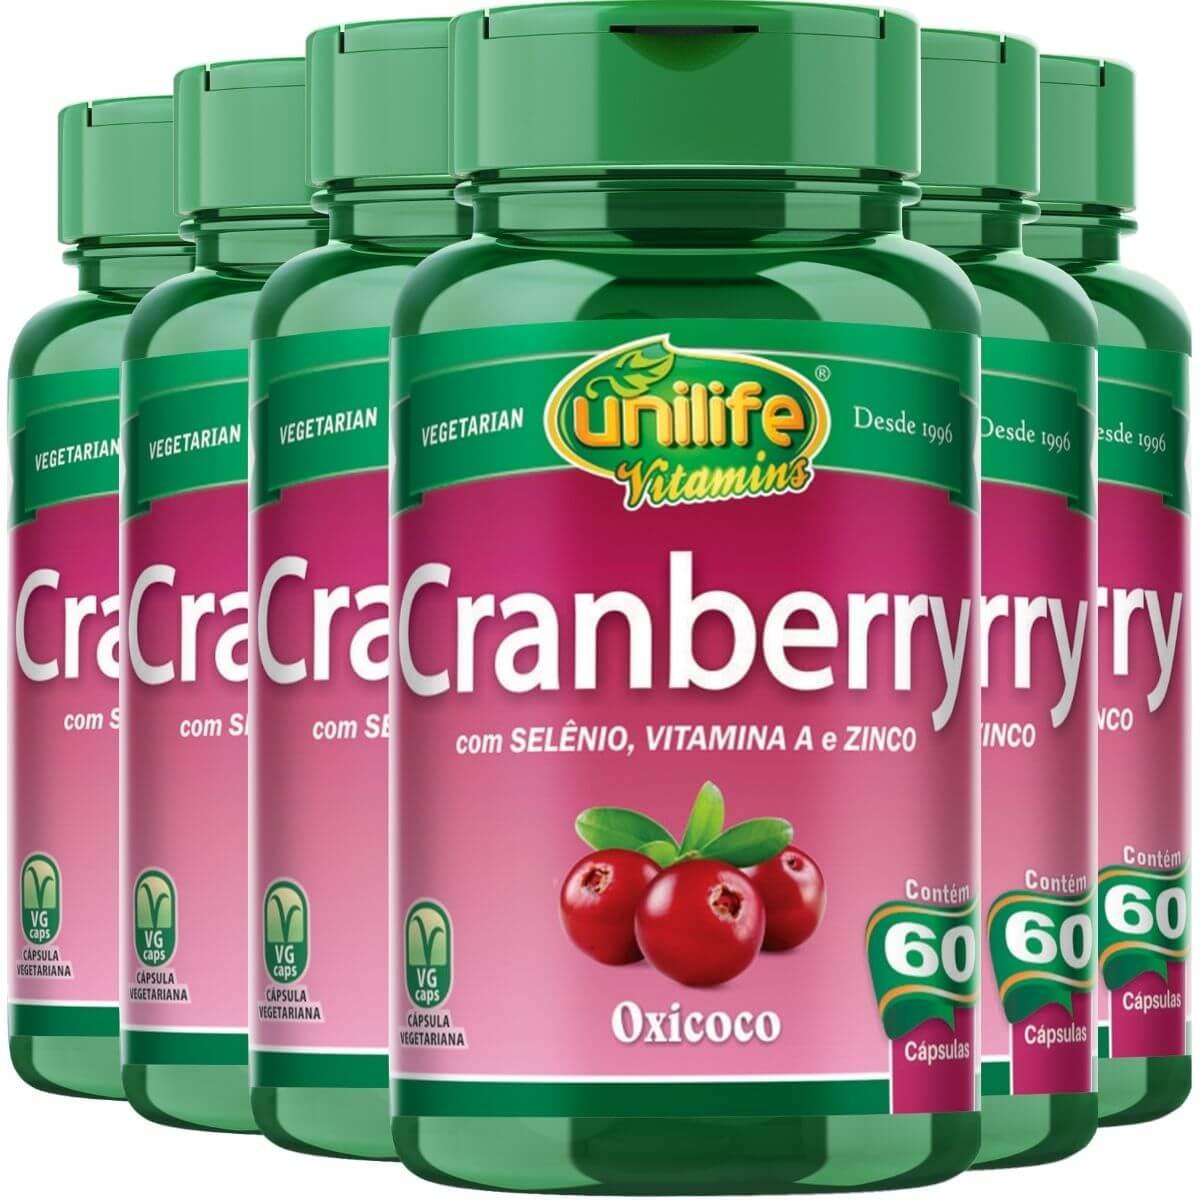 Kit 6 Cranberry Antioxidante 500mg 60 Capsulas - Unilife